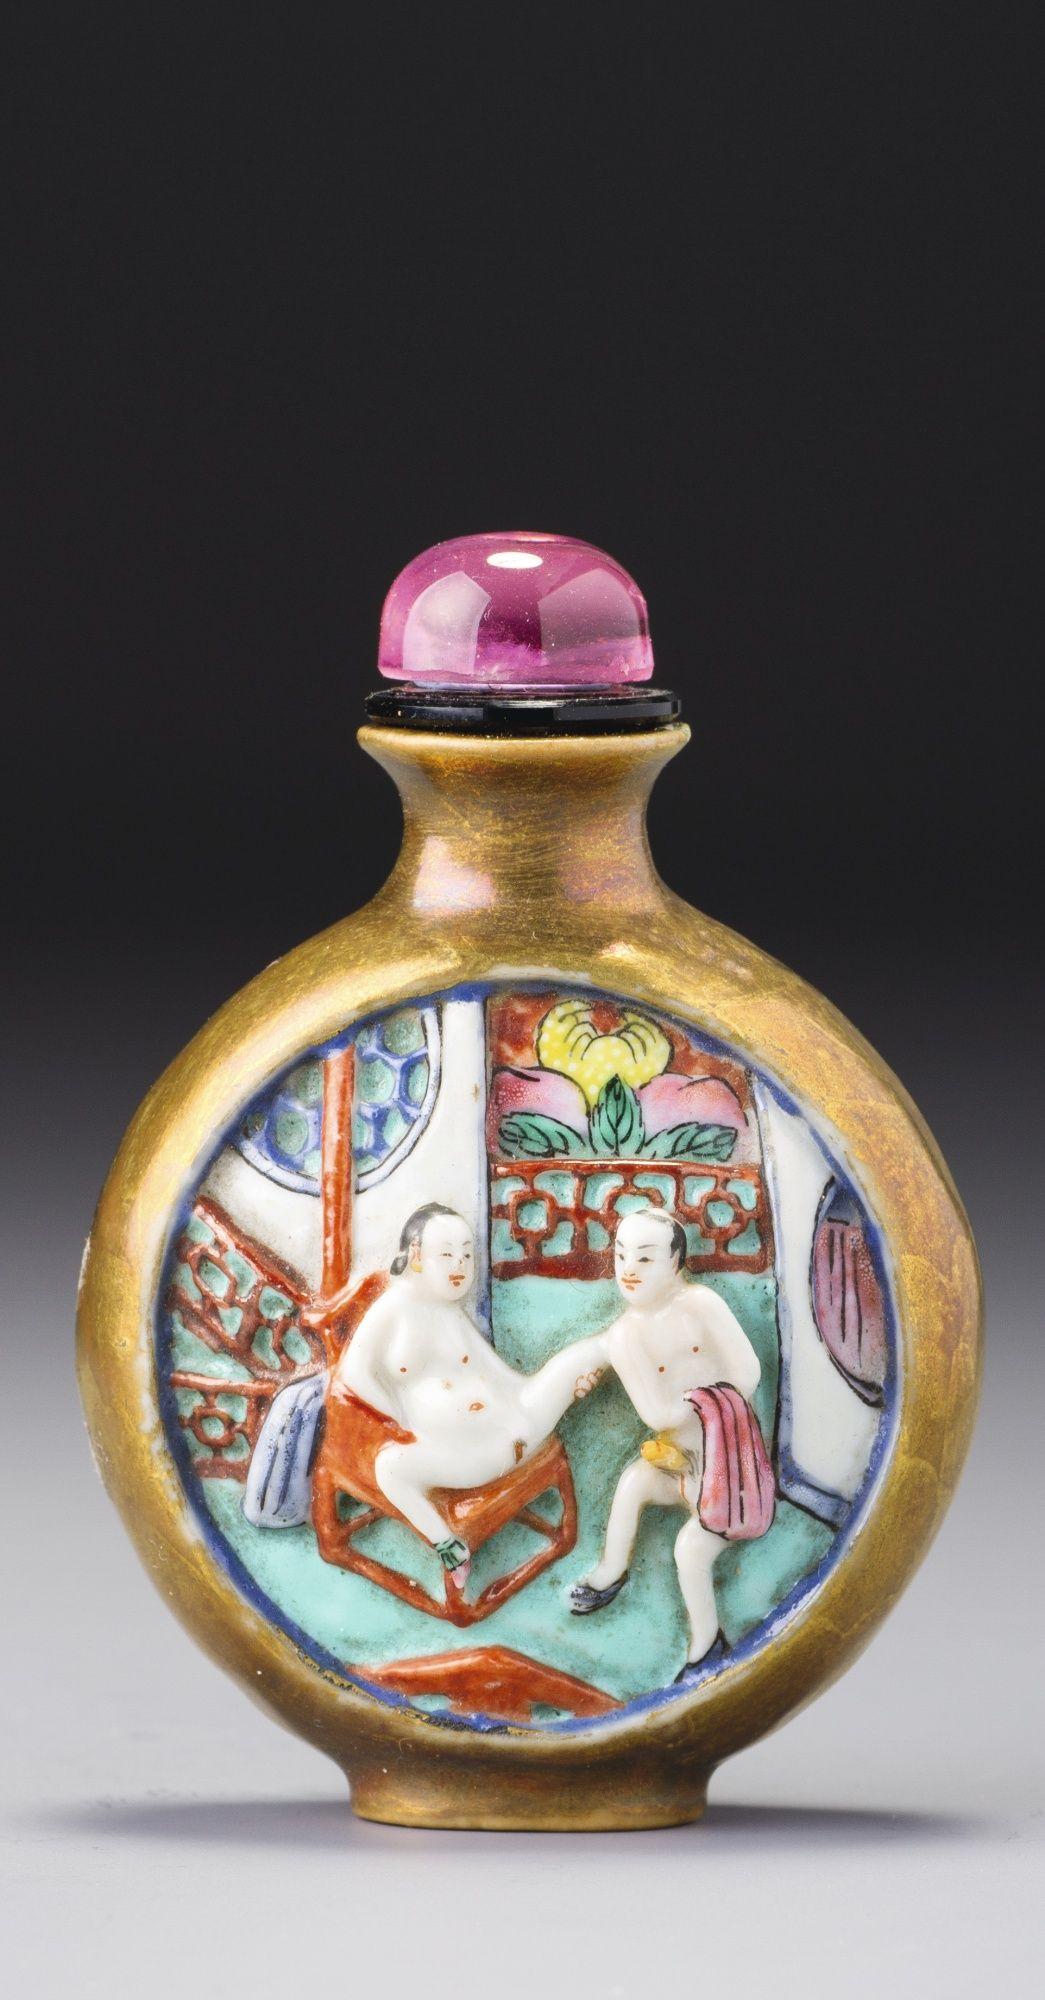 Chinese erotic snuff bottles